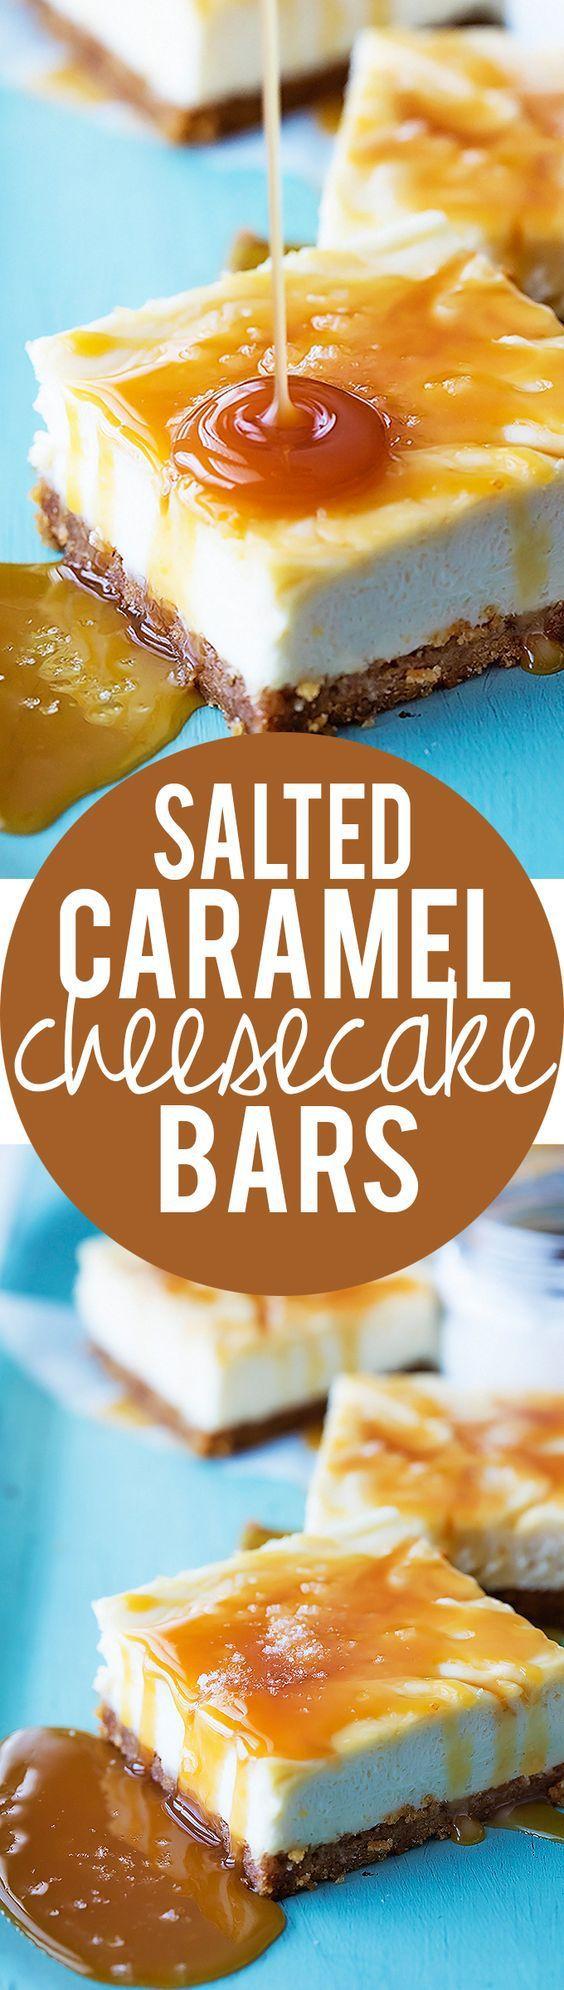 Salted Caramel Cheesecake Bars Recipe via Creme de la Crumb